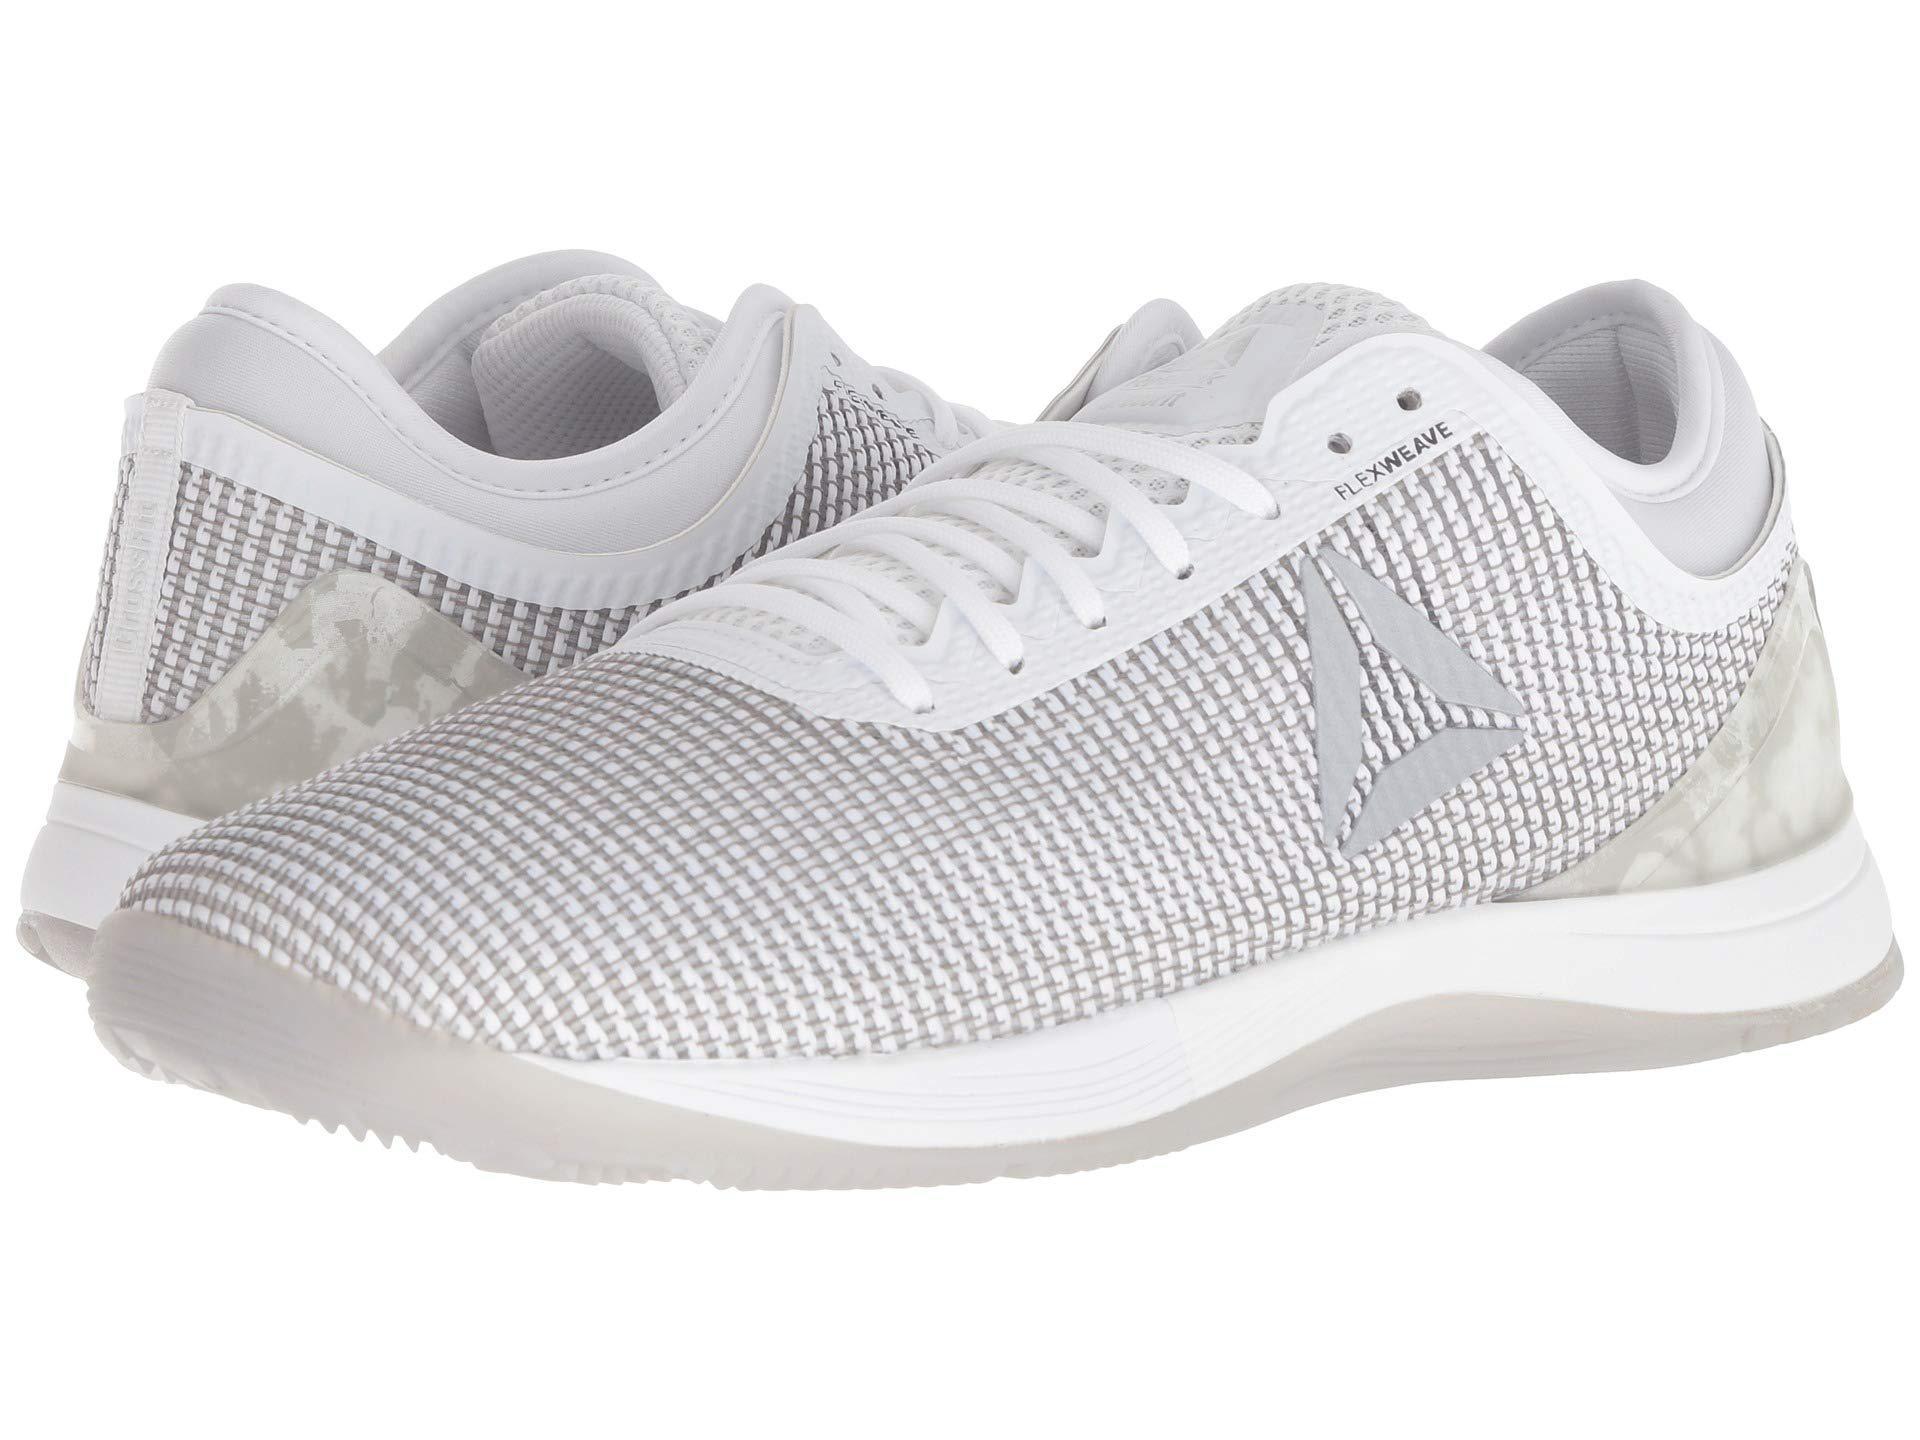 d978333e488 Reebok. Gray Crossfit(r) Nano 8.0 (tin Grey shark lemon Zest ash Grey white)  Men s Cross Training Shoes